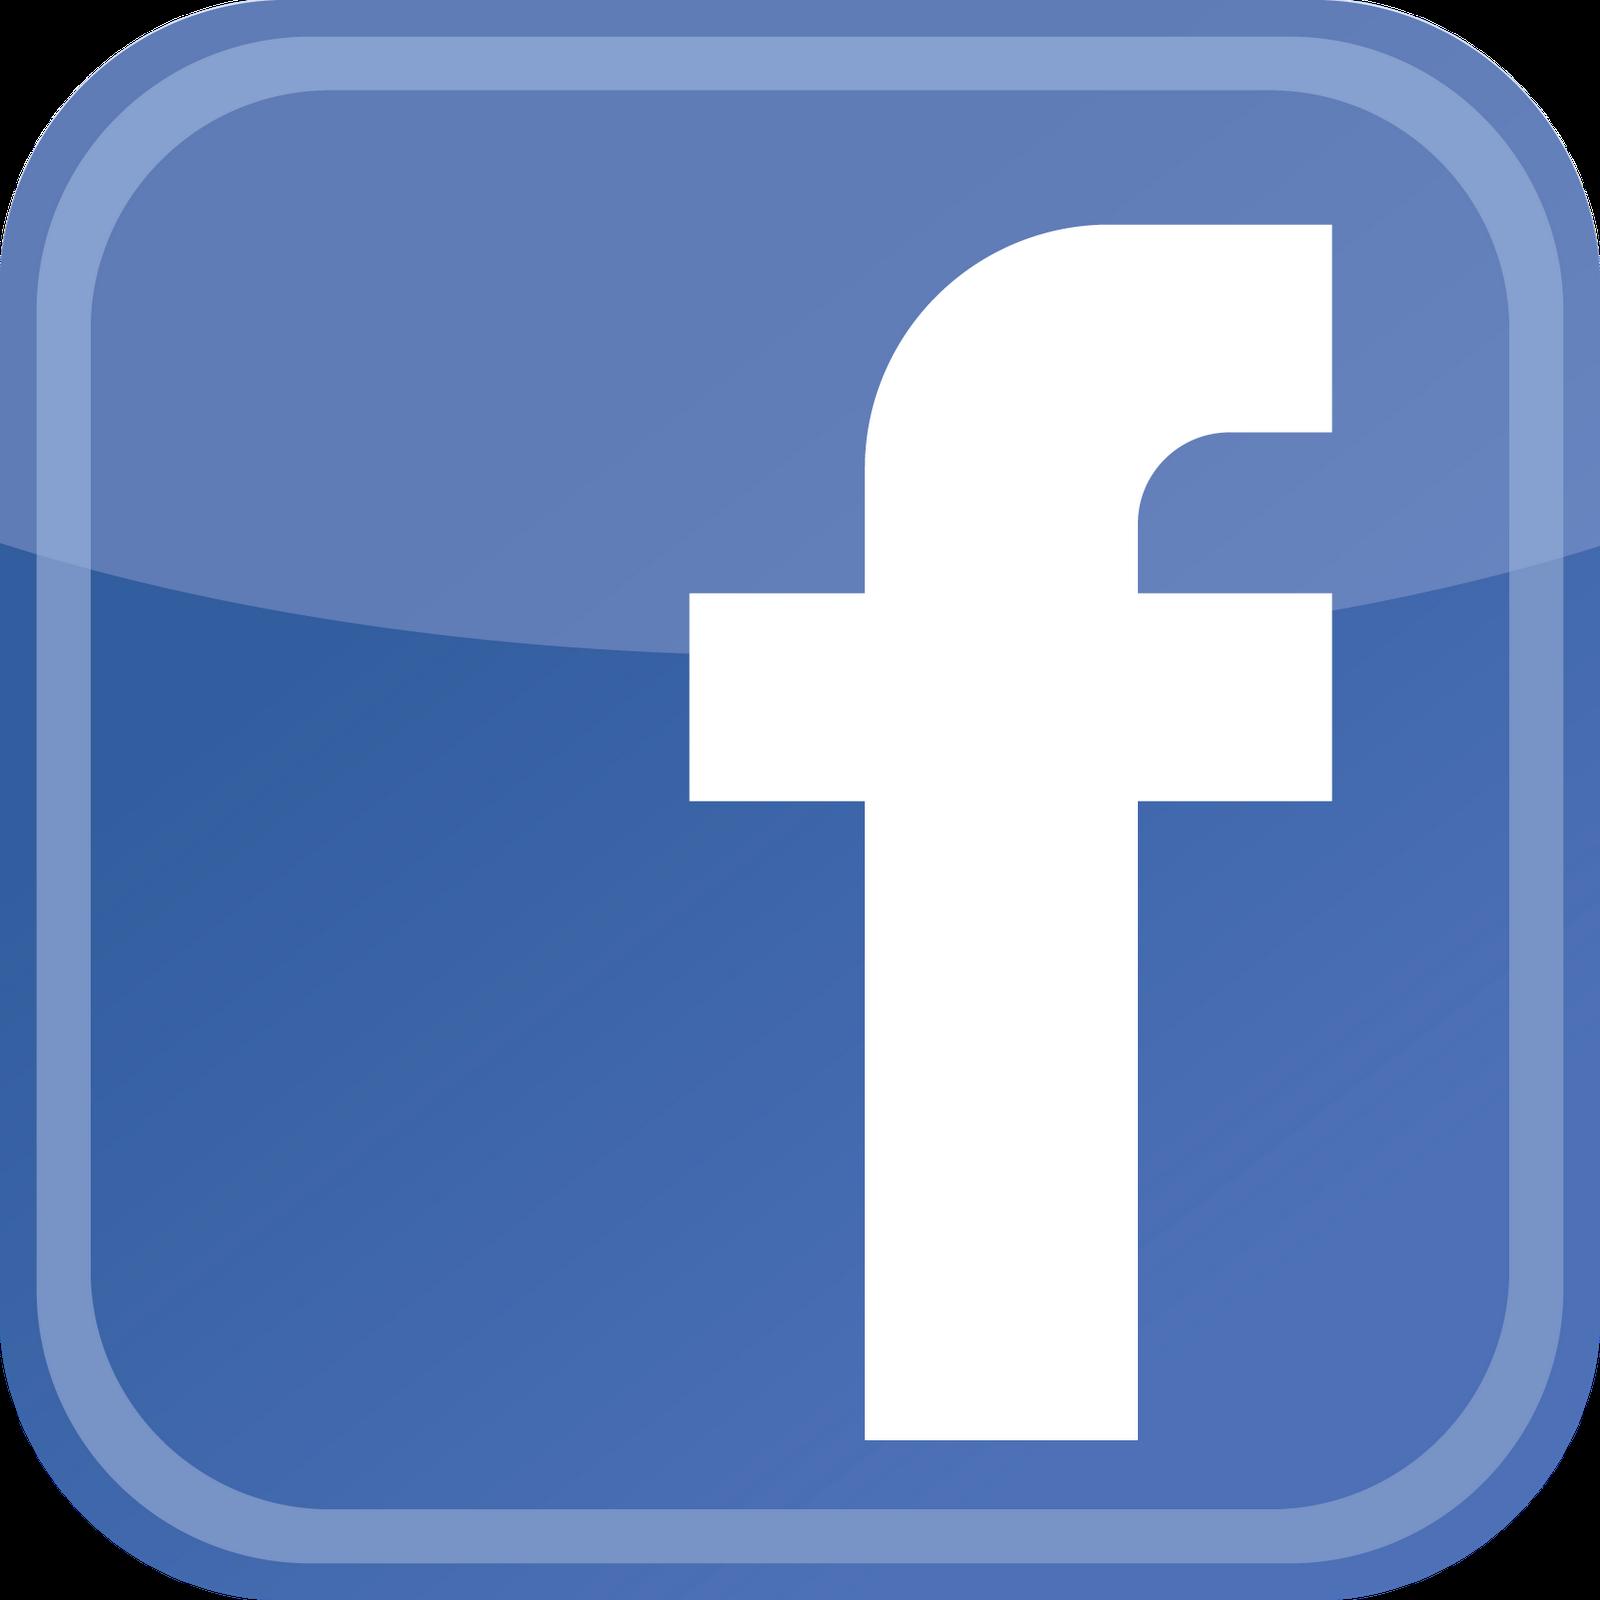 Free Facebook Symbol Transparent Background, Download Free.